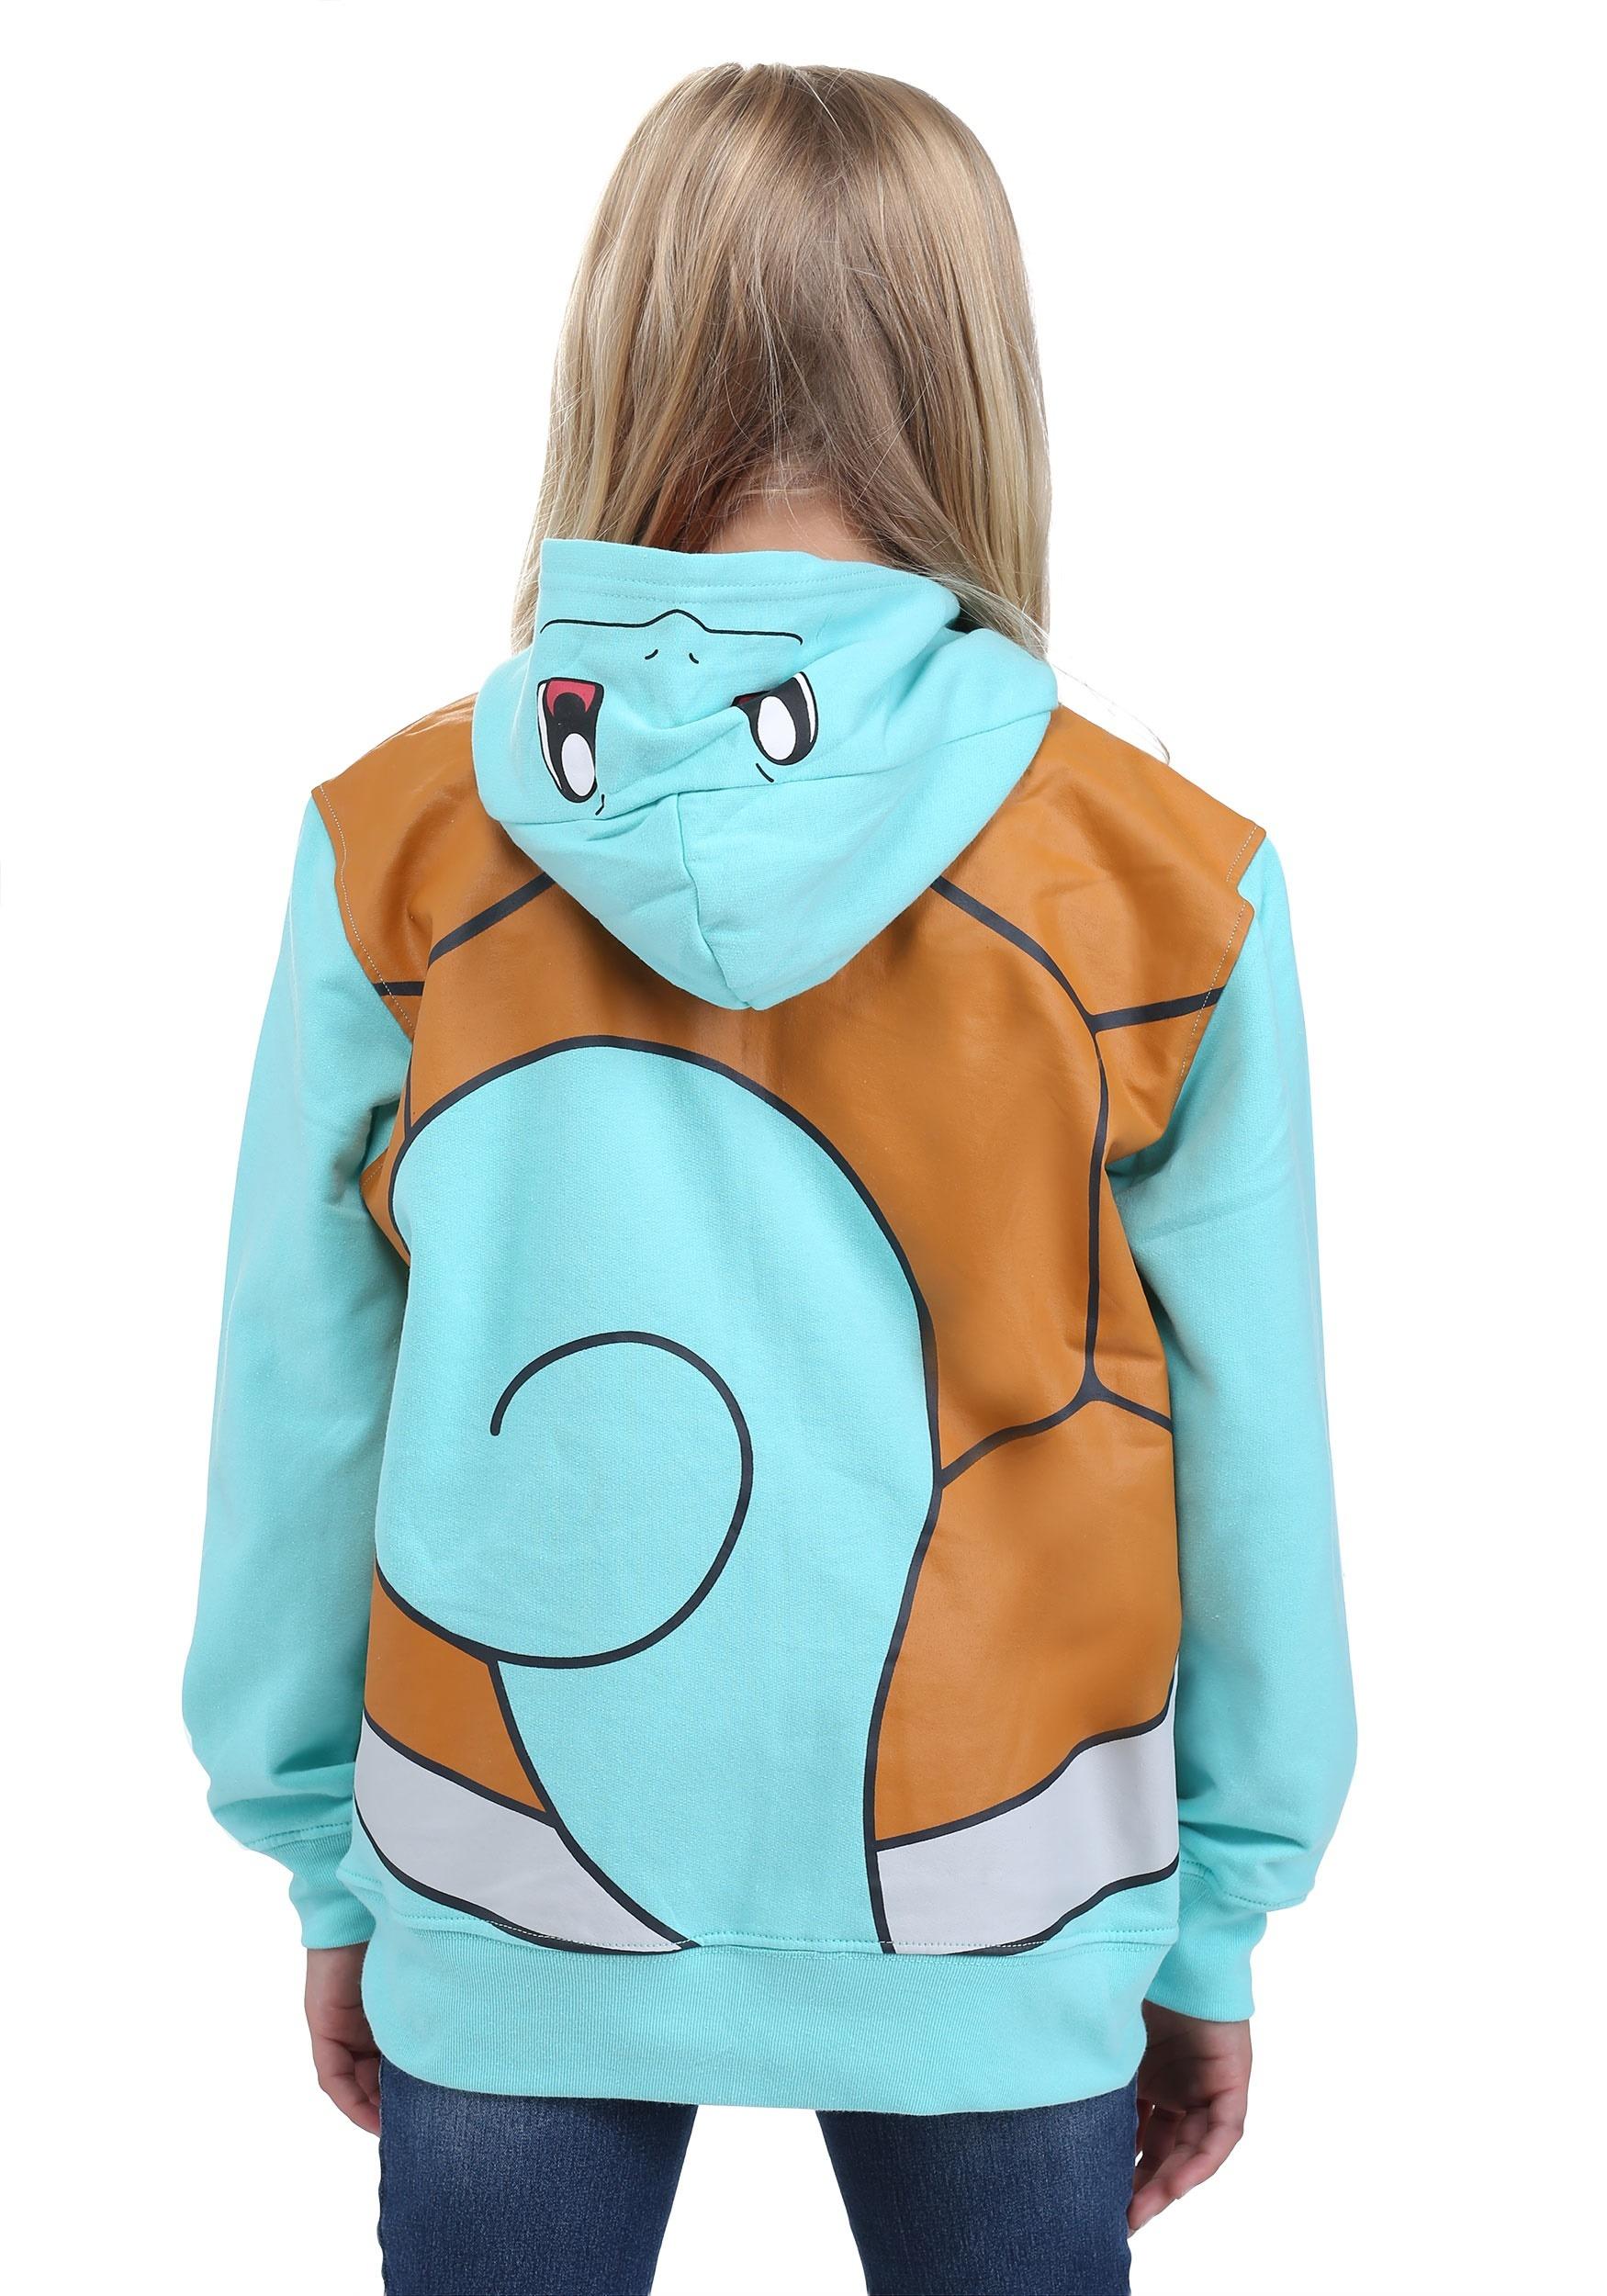 Pokemon Squirtle Kids Costume Hoodie For Kids-2901